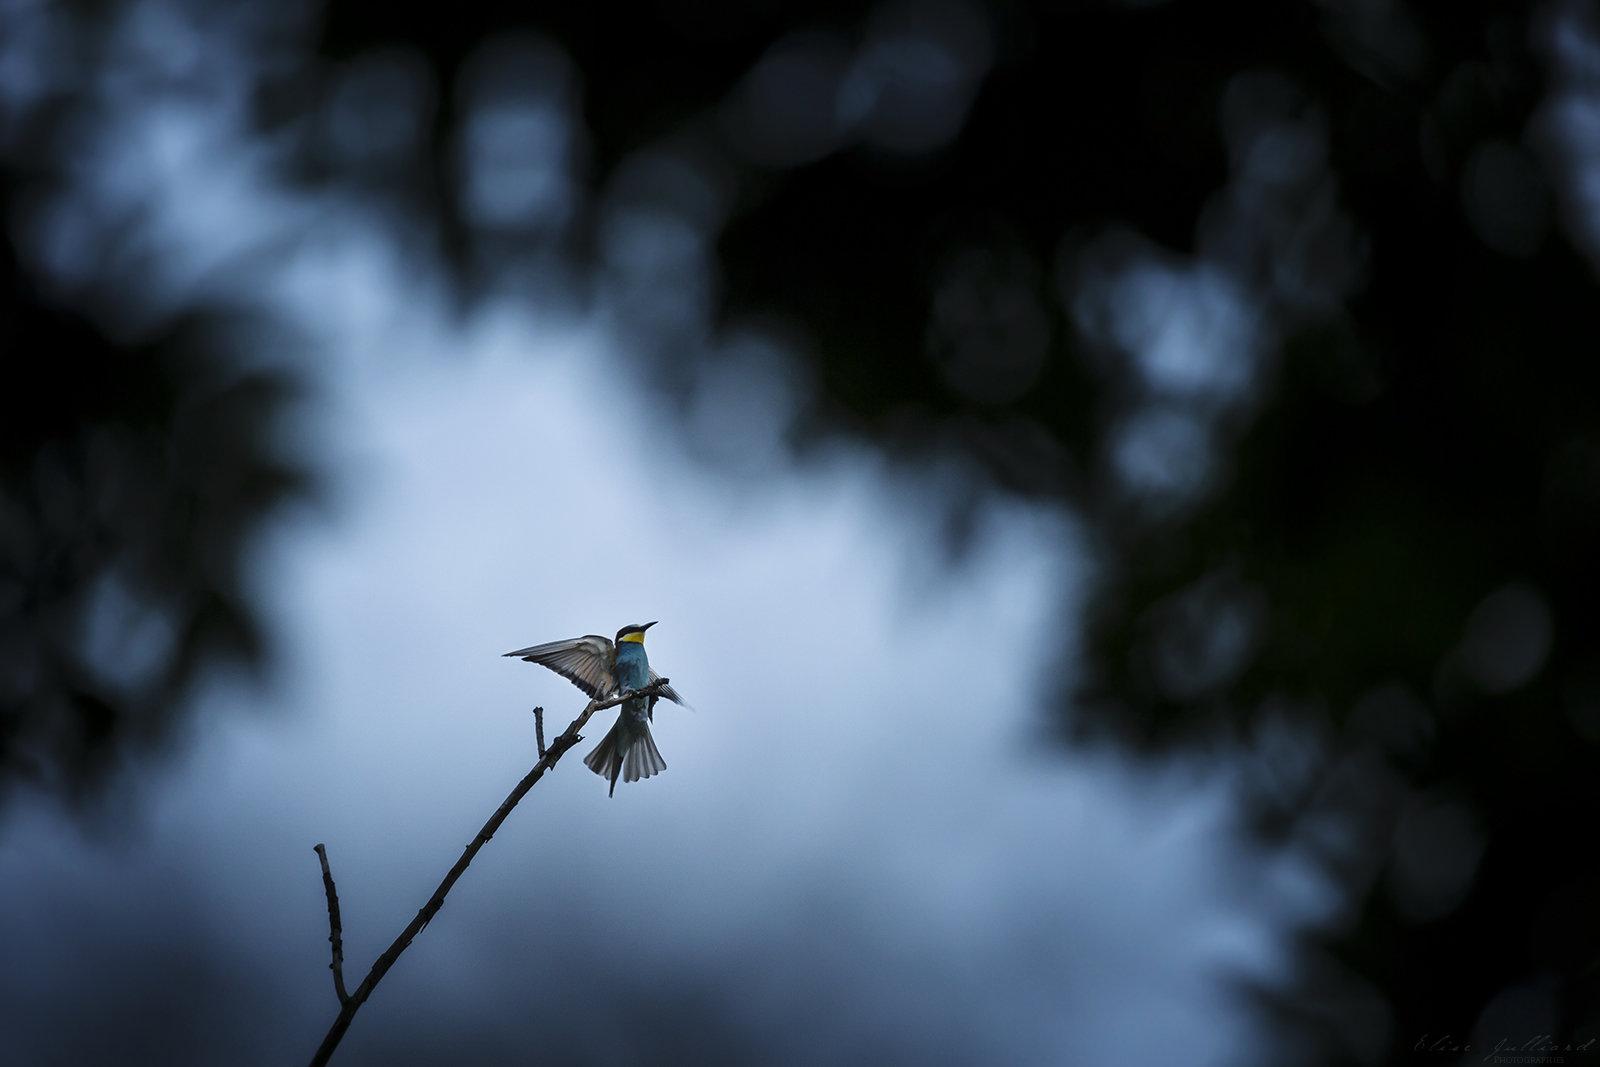 elise-julliard-photographe-oiseaux-animalier-guepiers-europe-lyon-miribel-jonage-rhone-alpes-2